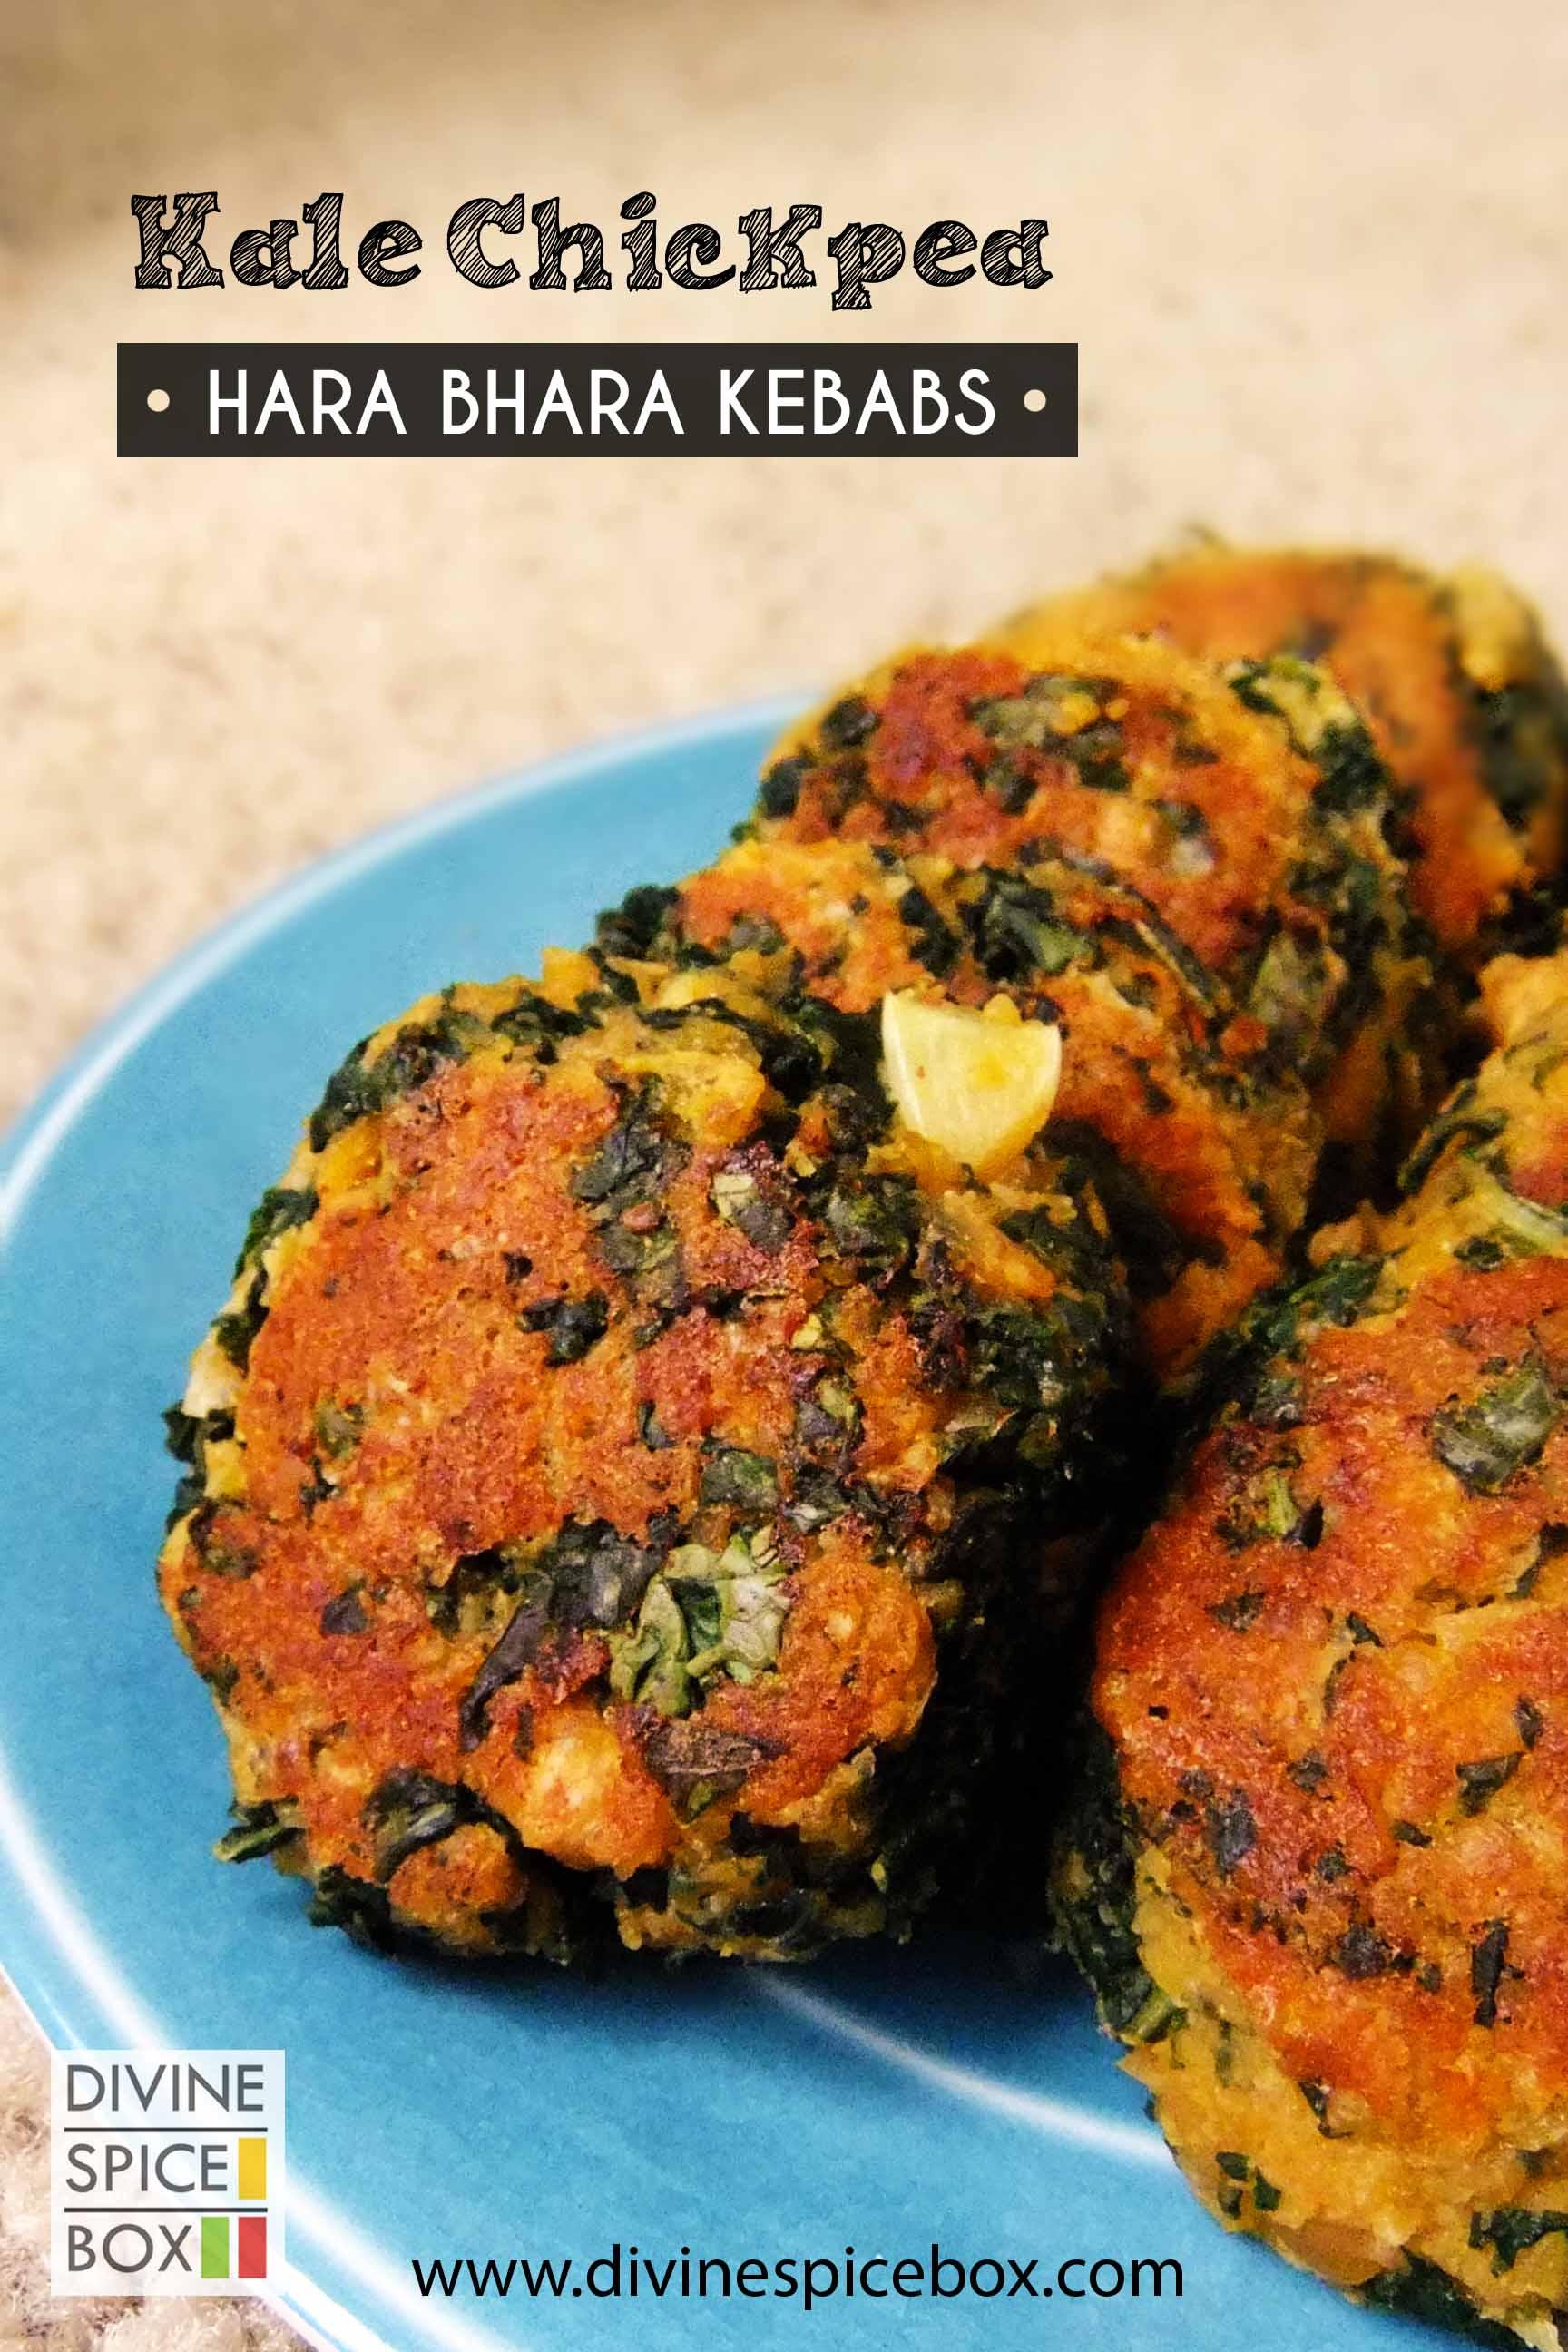 kale chickpea hara bhara kebab copy